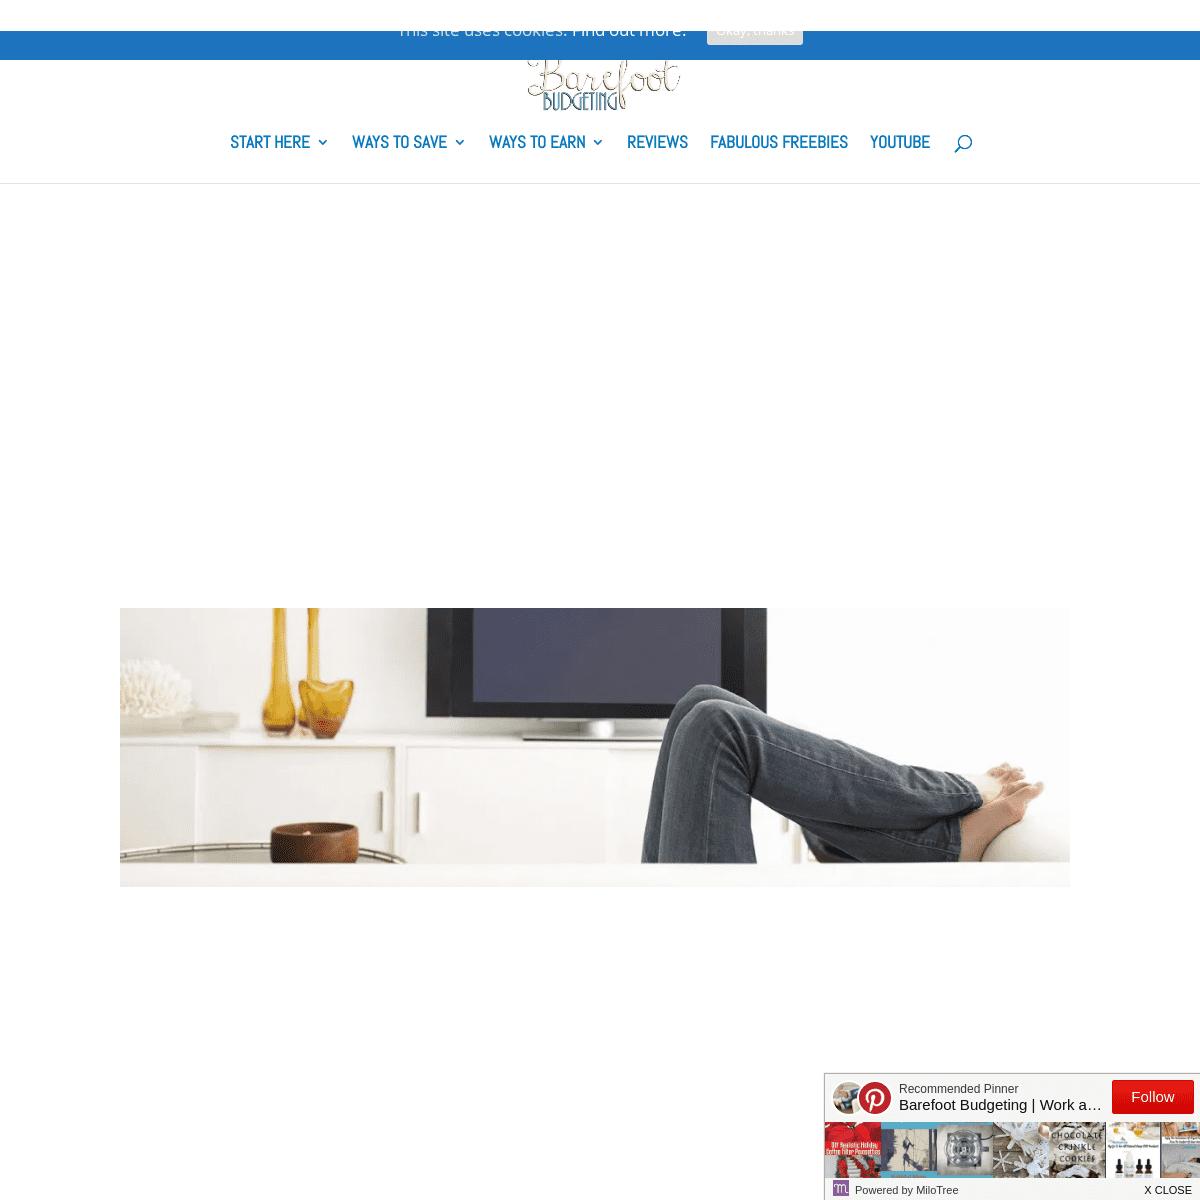 Barefoot Budgeting Home - Barefoot Budgeting